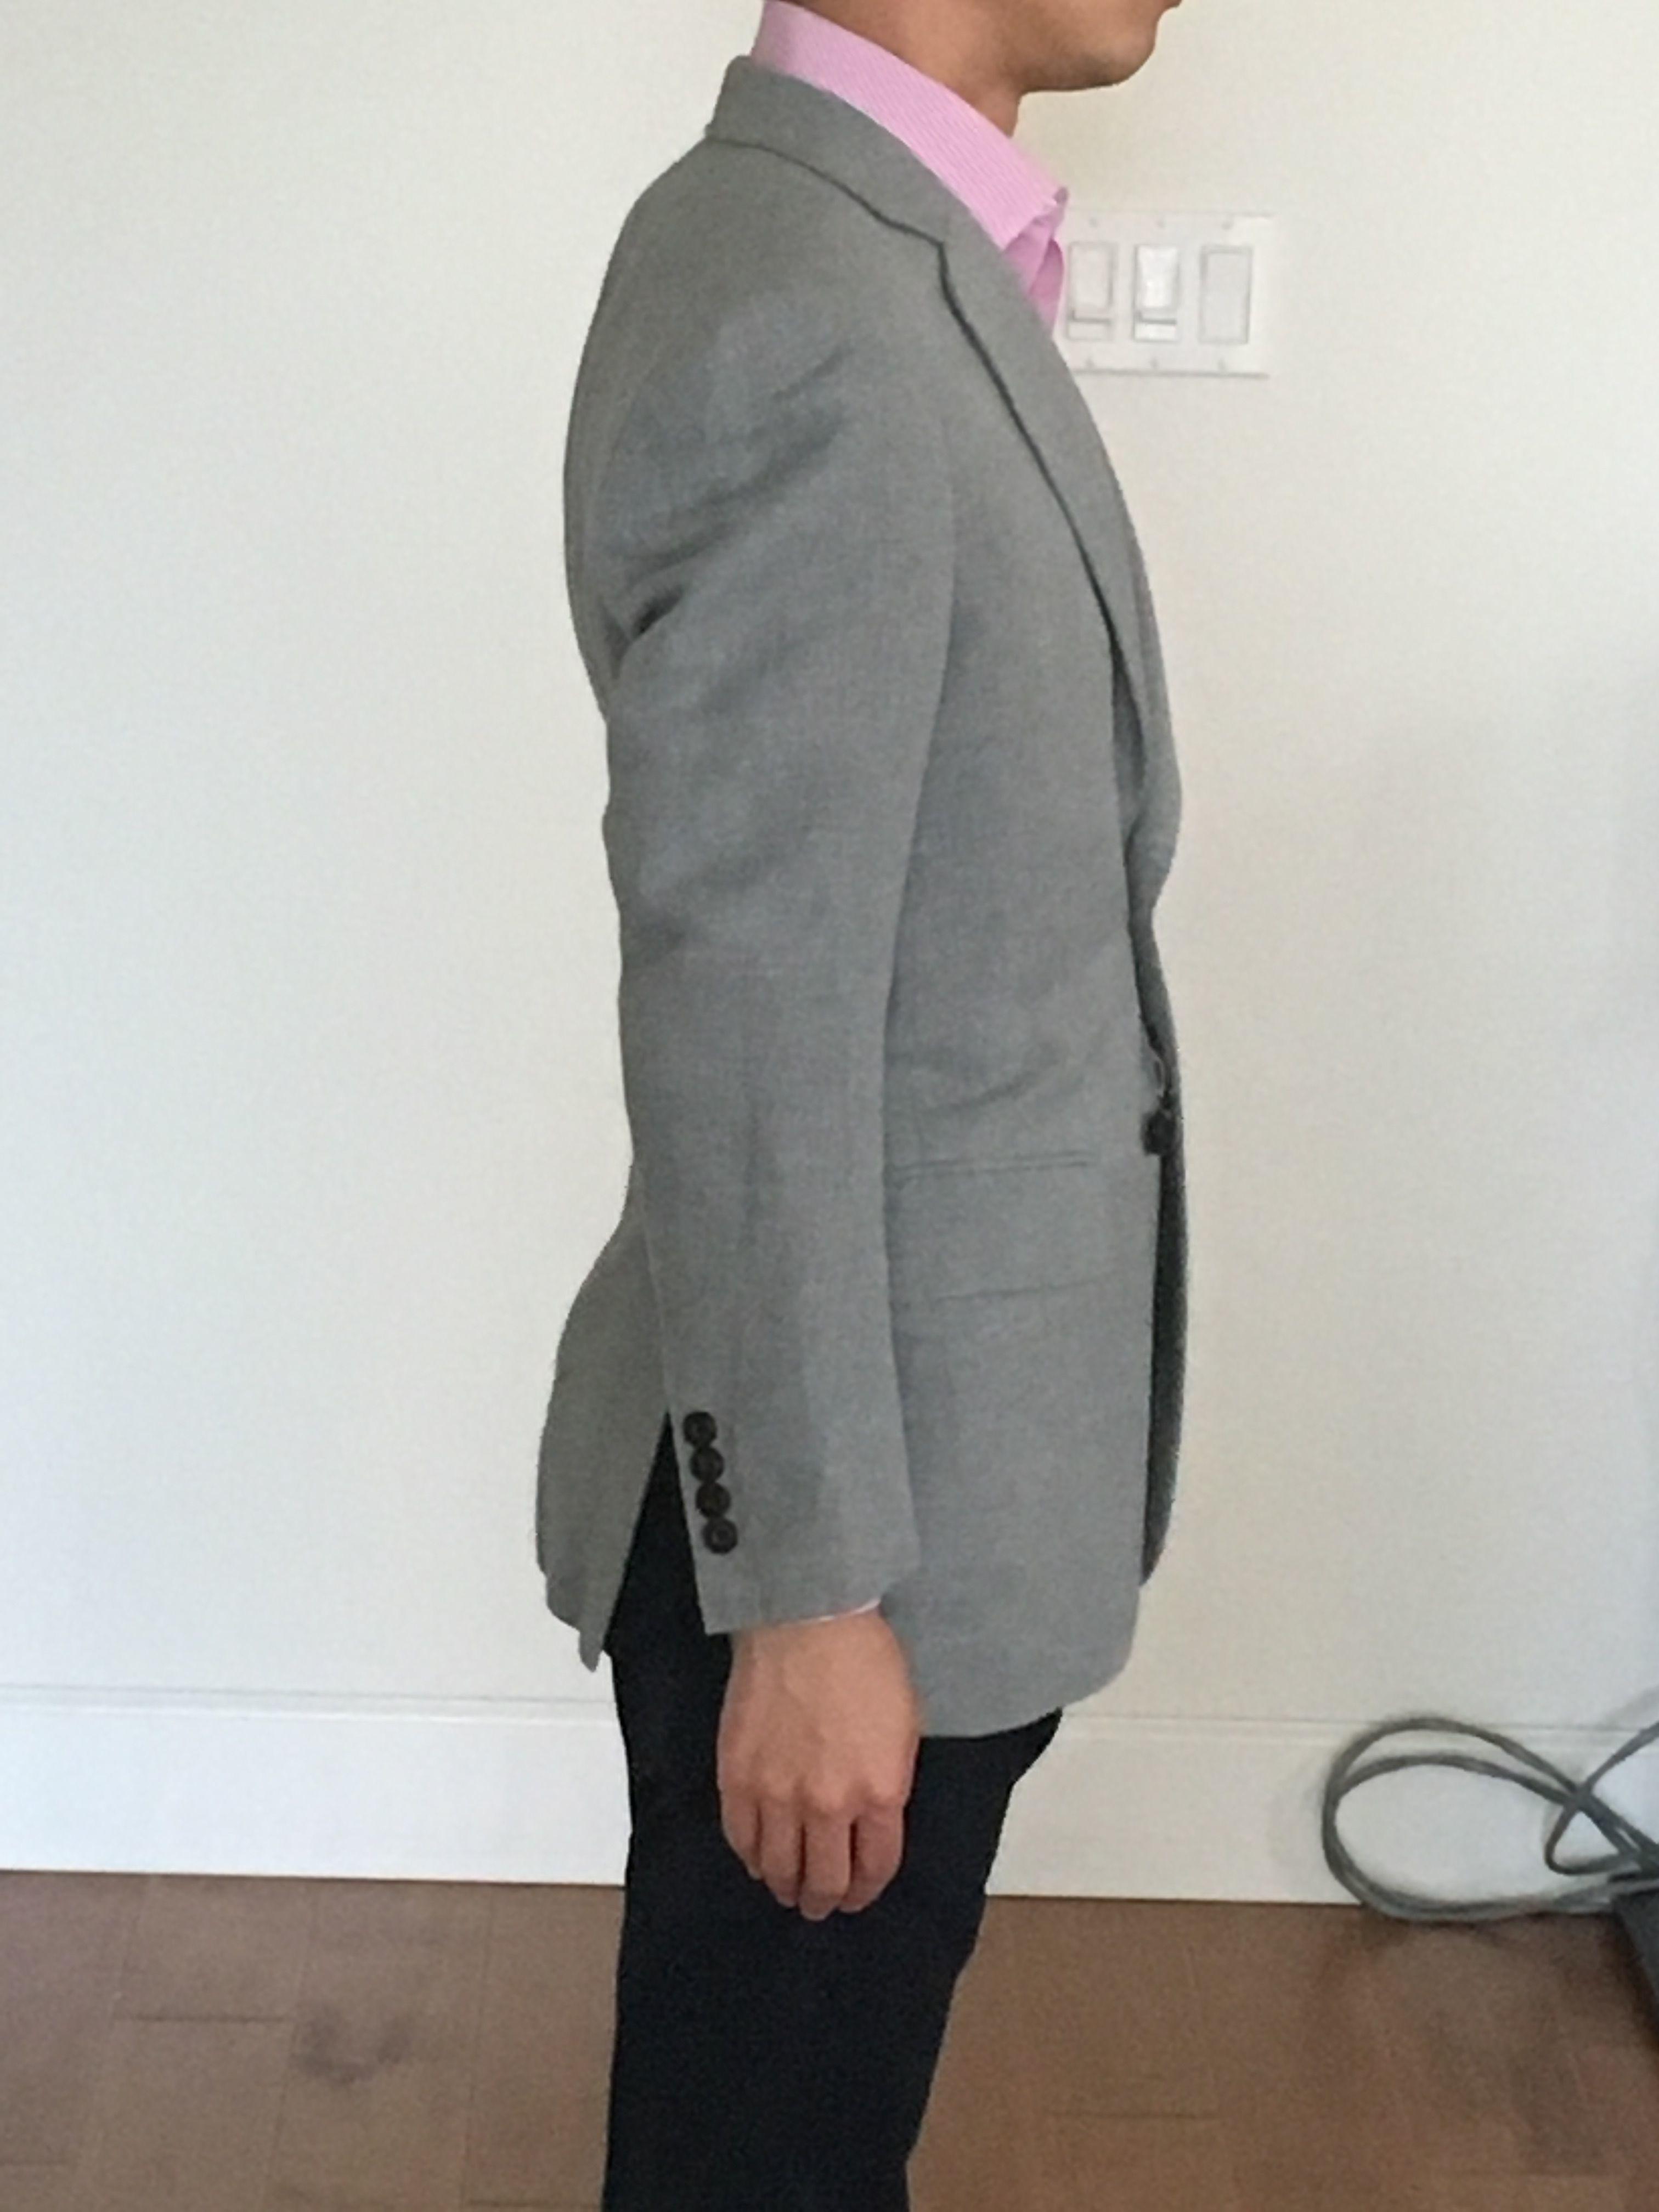 Tried quite some online MTMs | Styleforum